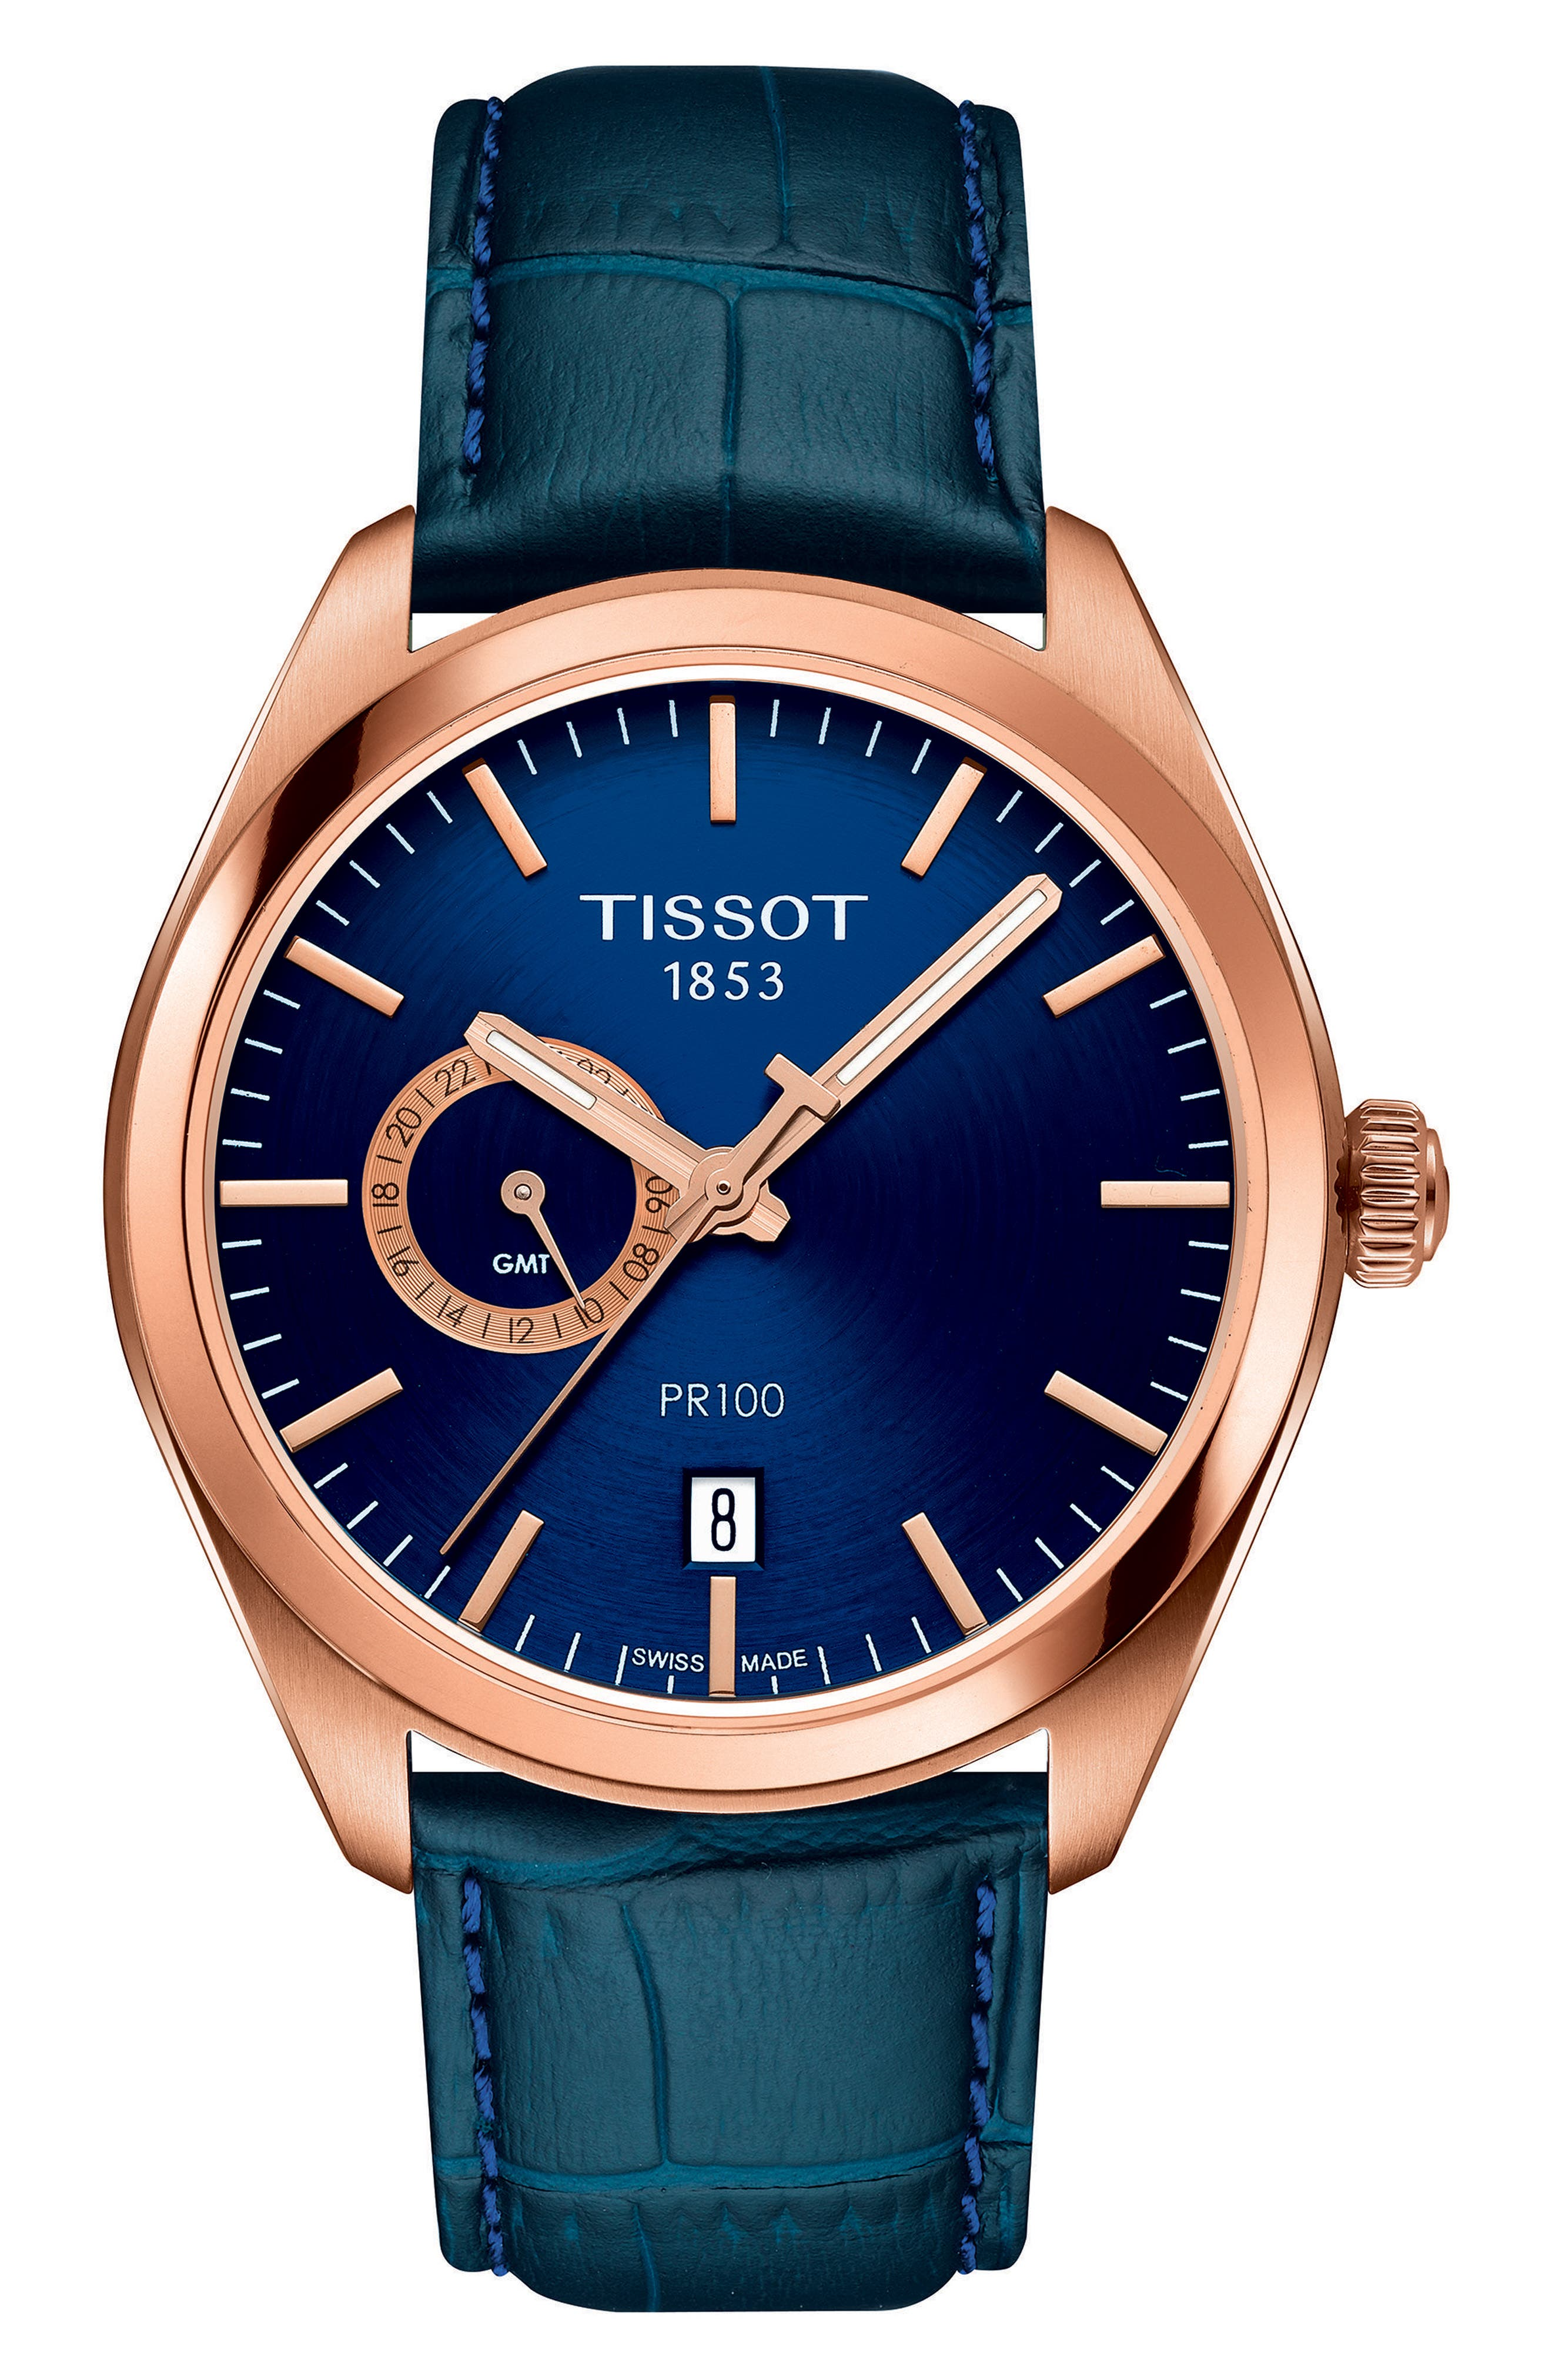 Tissot PR100 Leather Strap Watch, 39mm